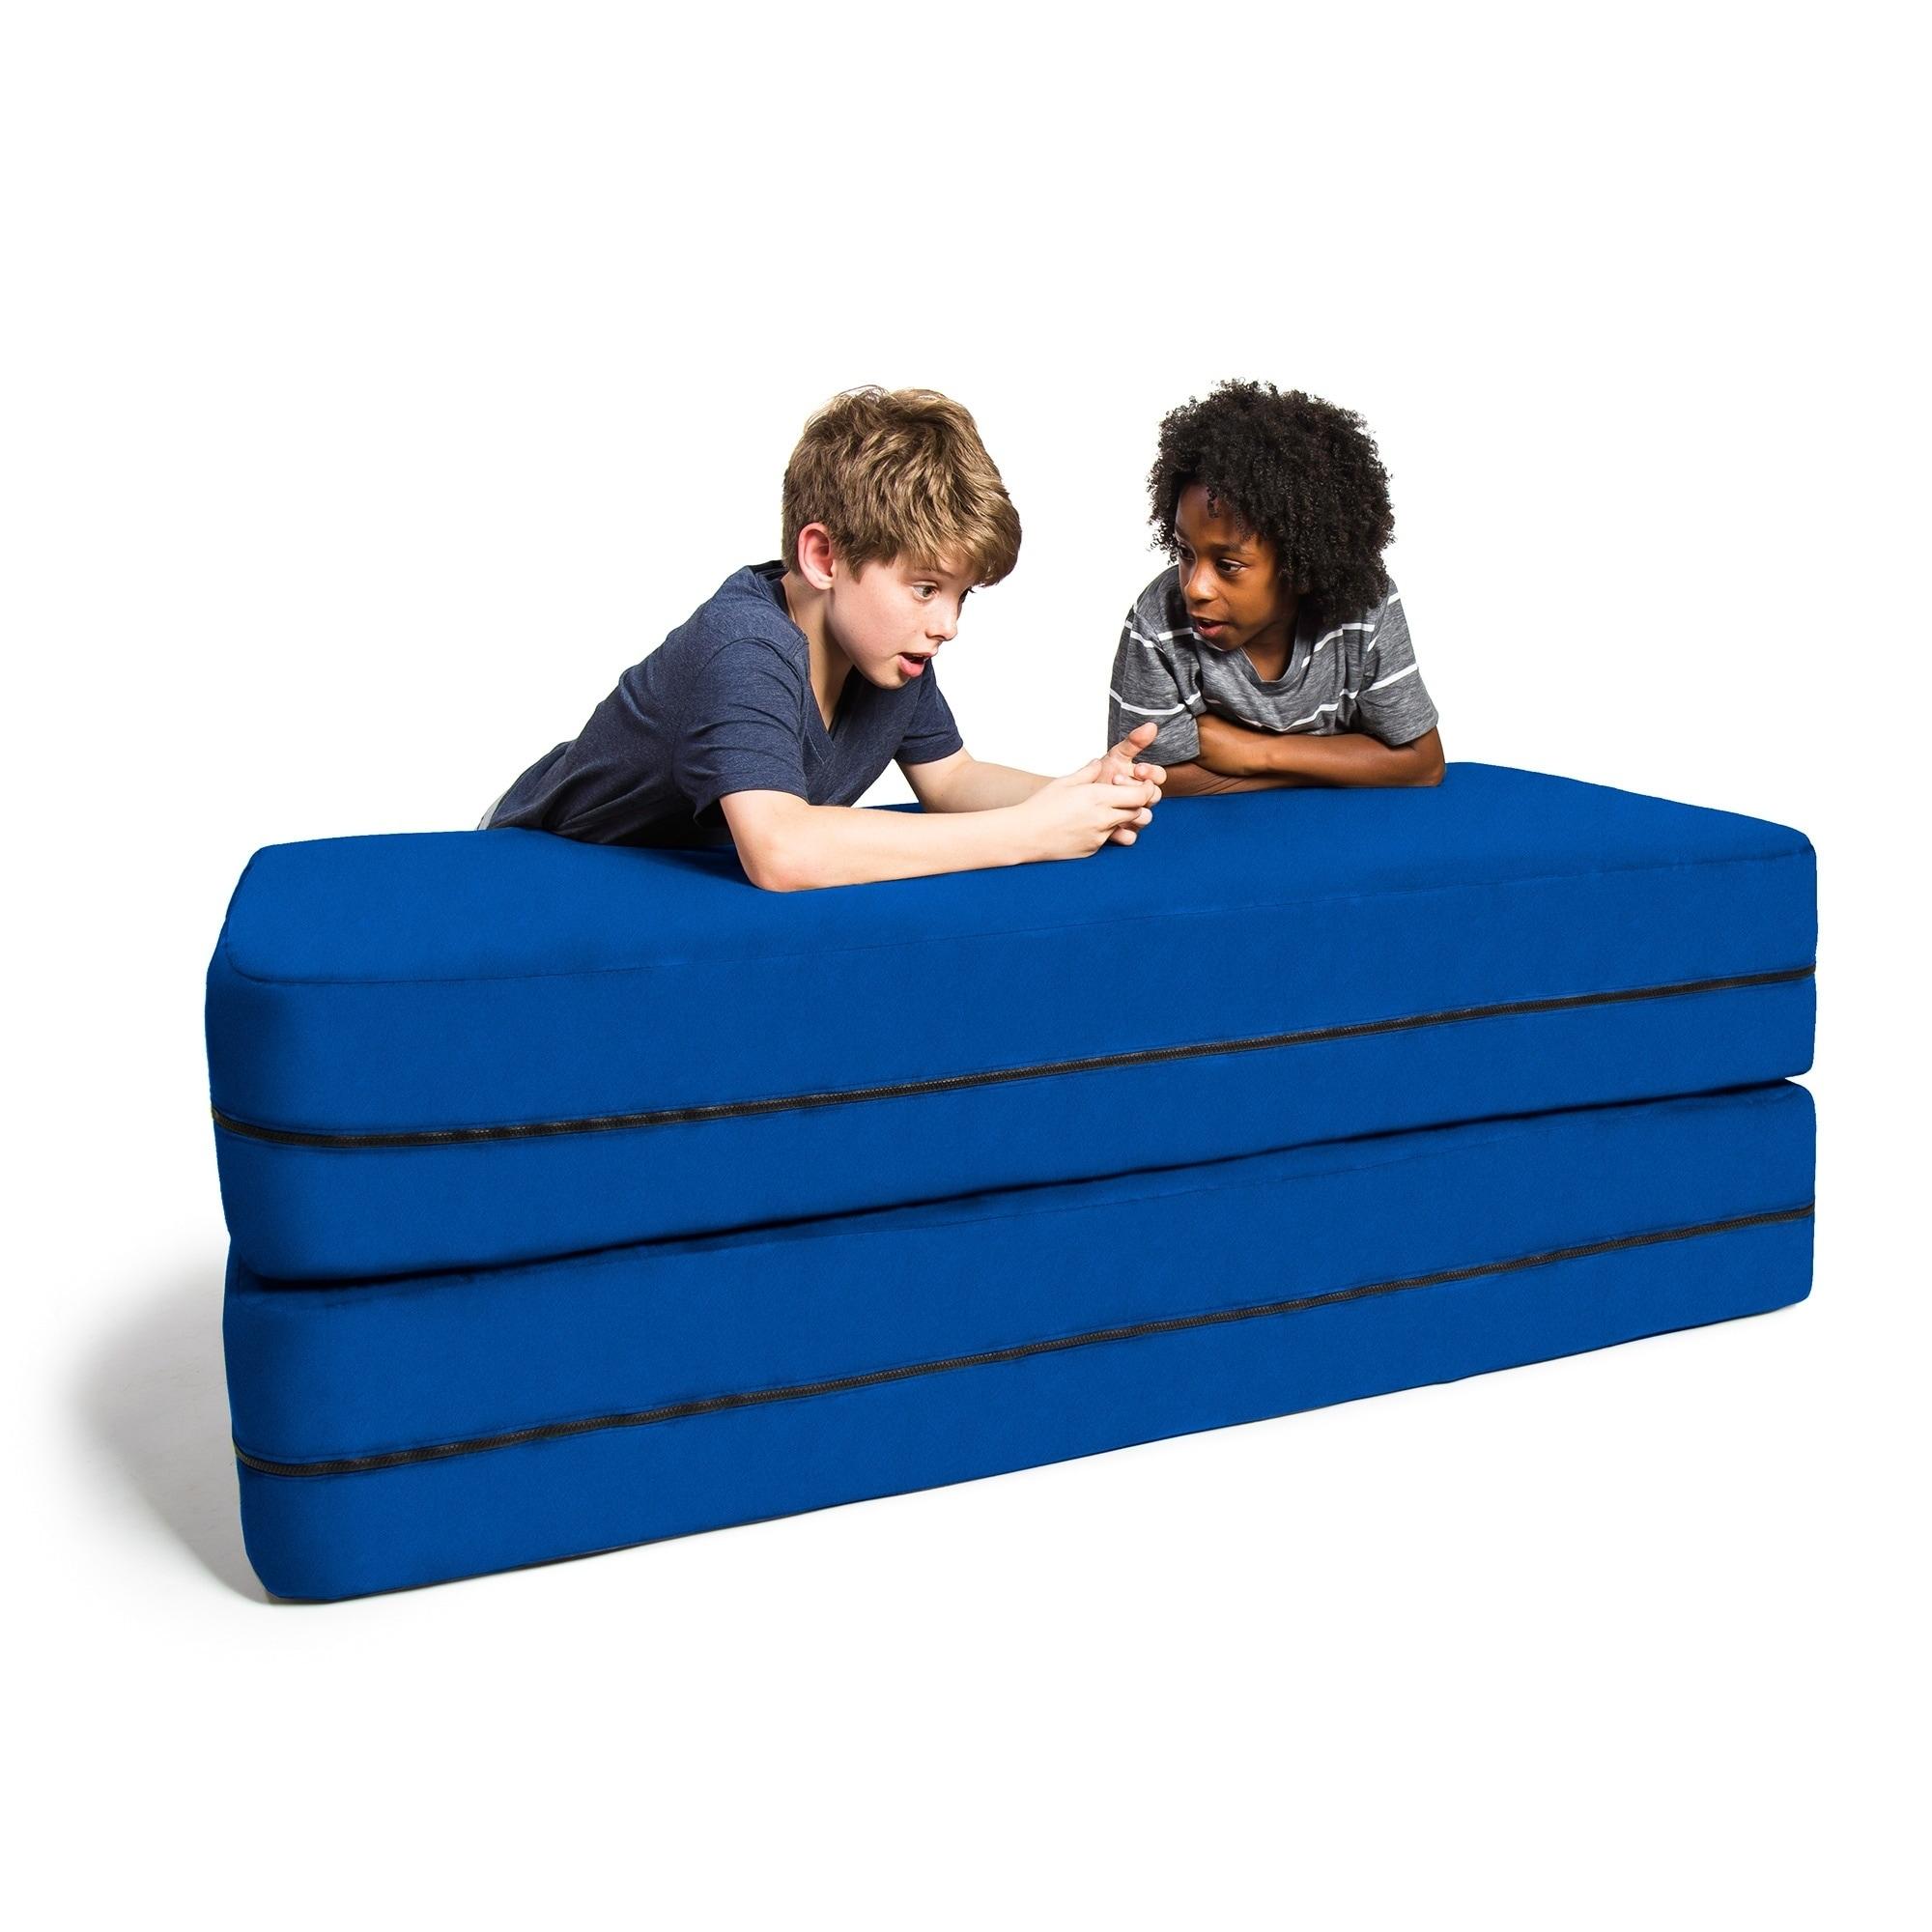 Ja Kids Convertible Sleeper Sofa Ottoman Set Free Shipping Today 16604749